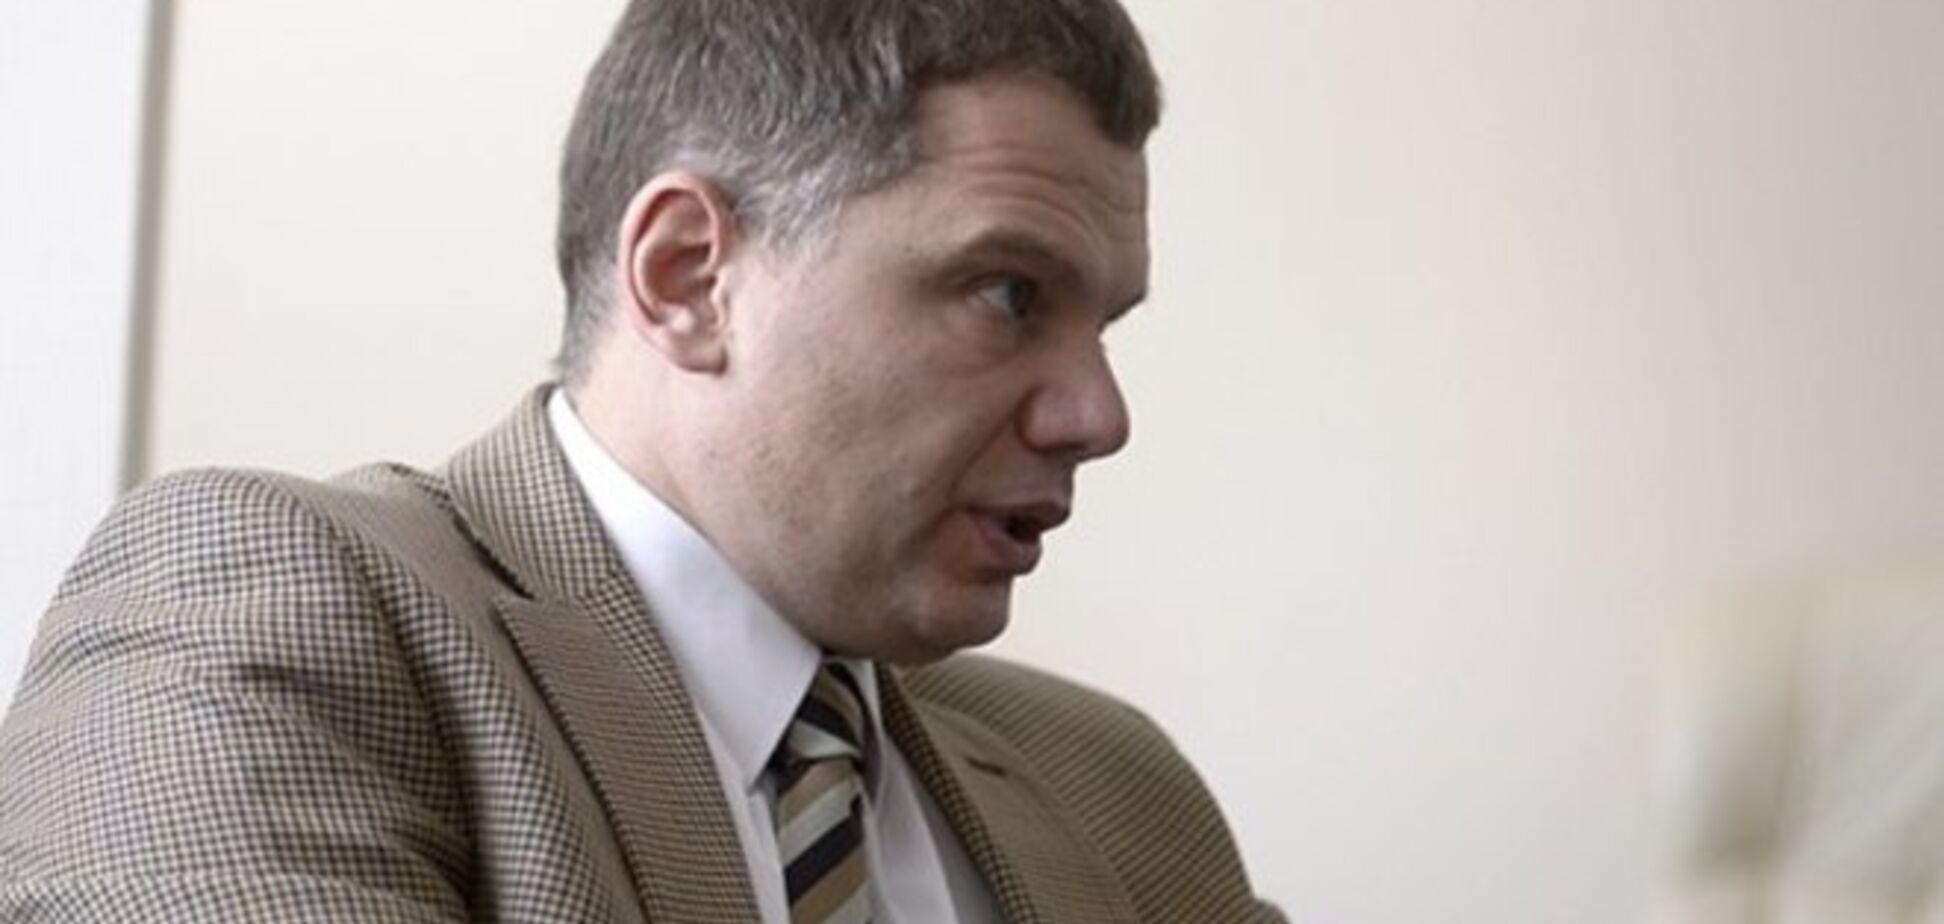 Гоцул: Булатов лично ищет Саладухе квартиру в Киеве